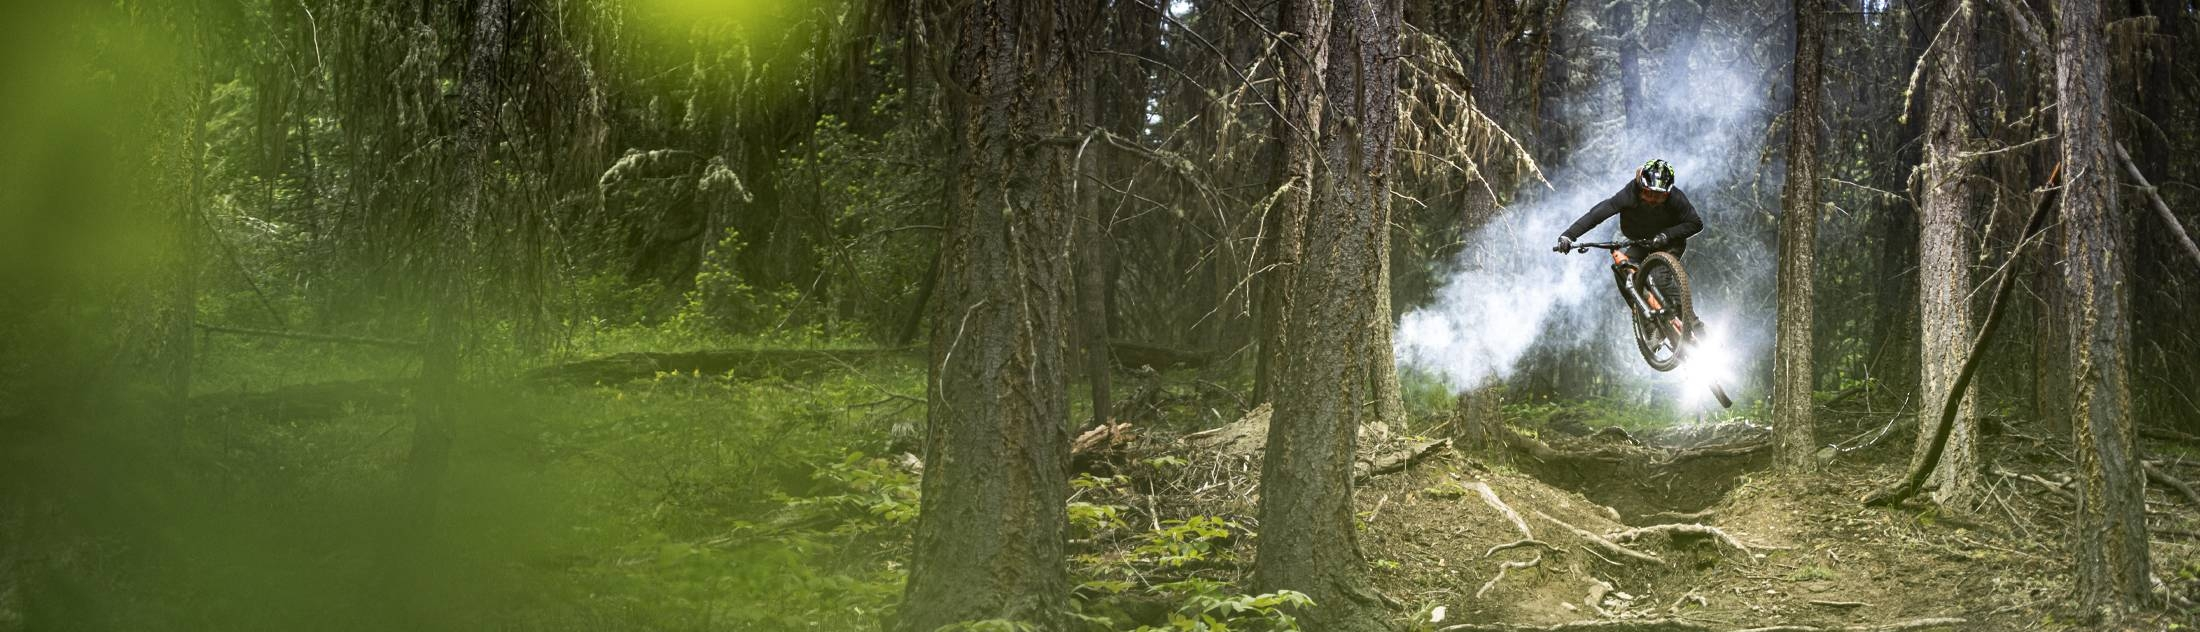 Evil Wreckoning in forest